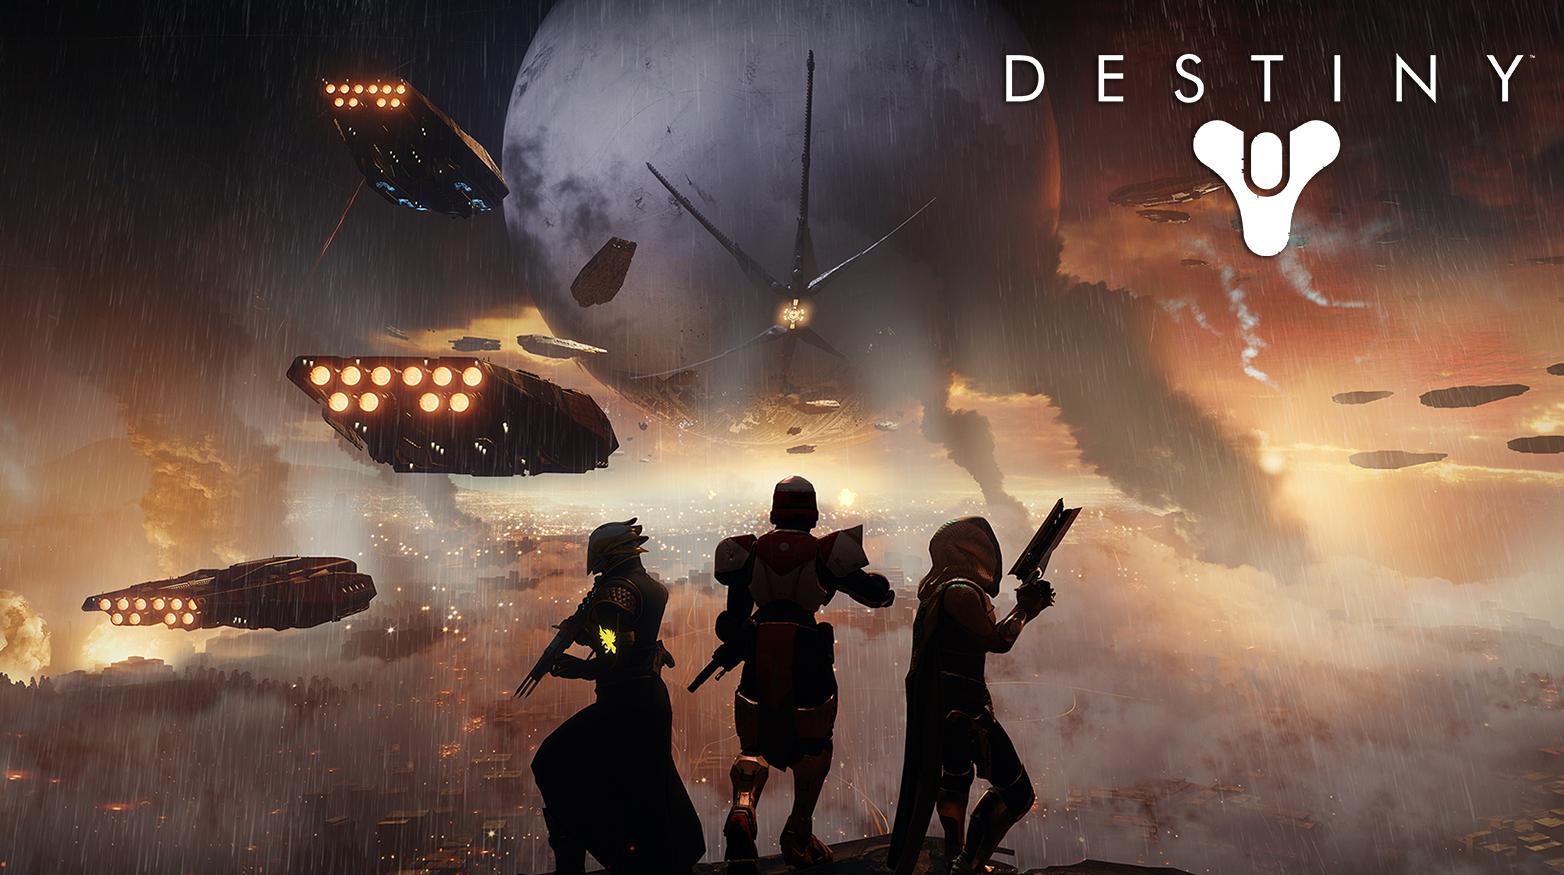 Destiny guardians surrounding by Cabal forces